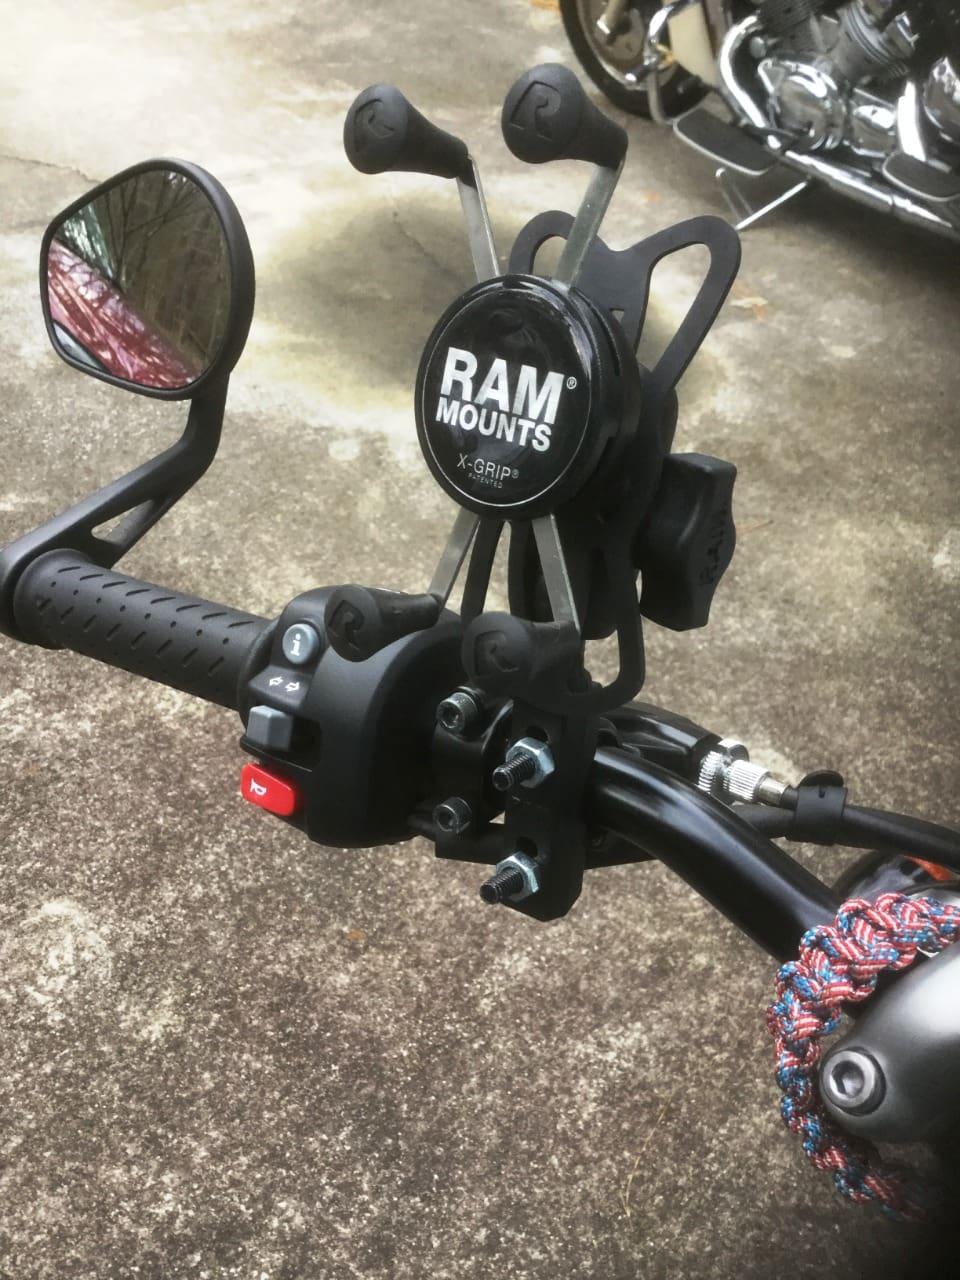 picture of RAM Mounts X-Grip